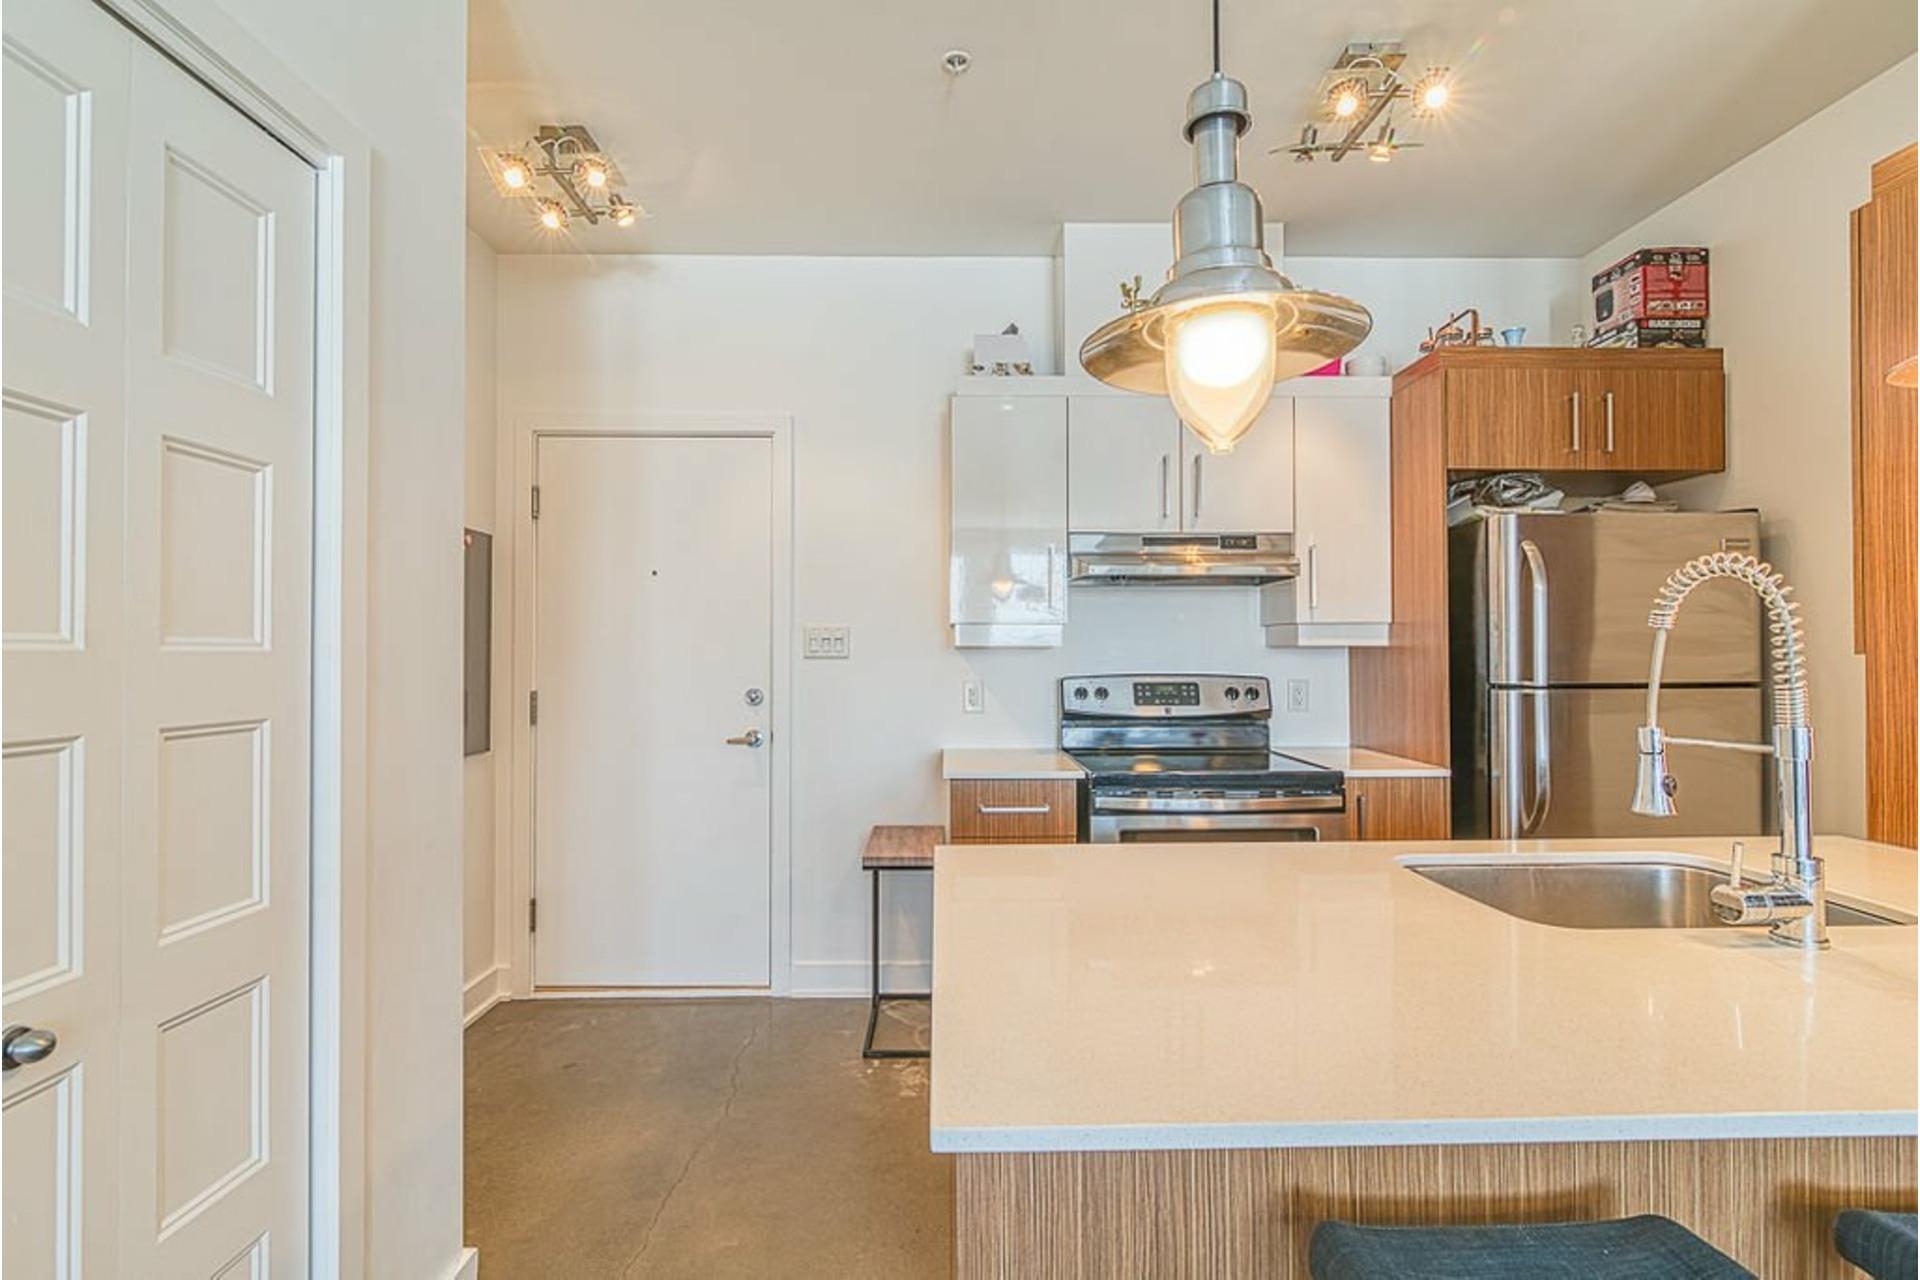 image 1 - Apartment For sale Blainville - 4 rooms